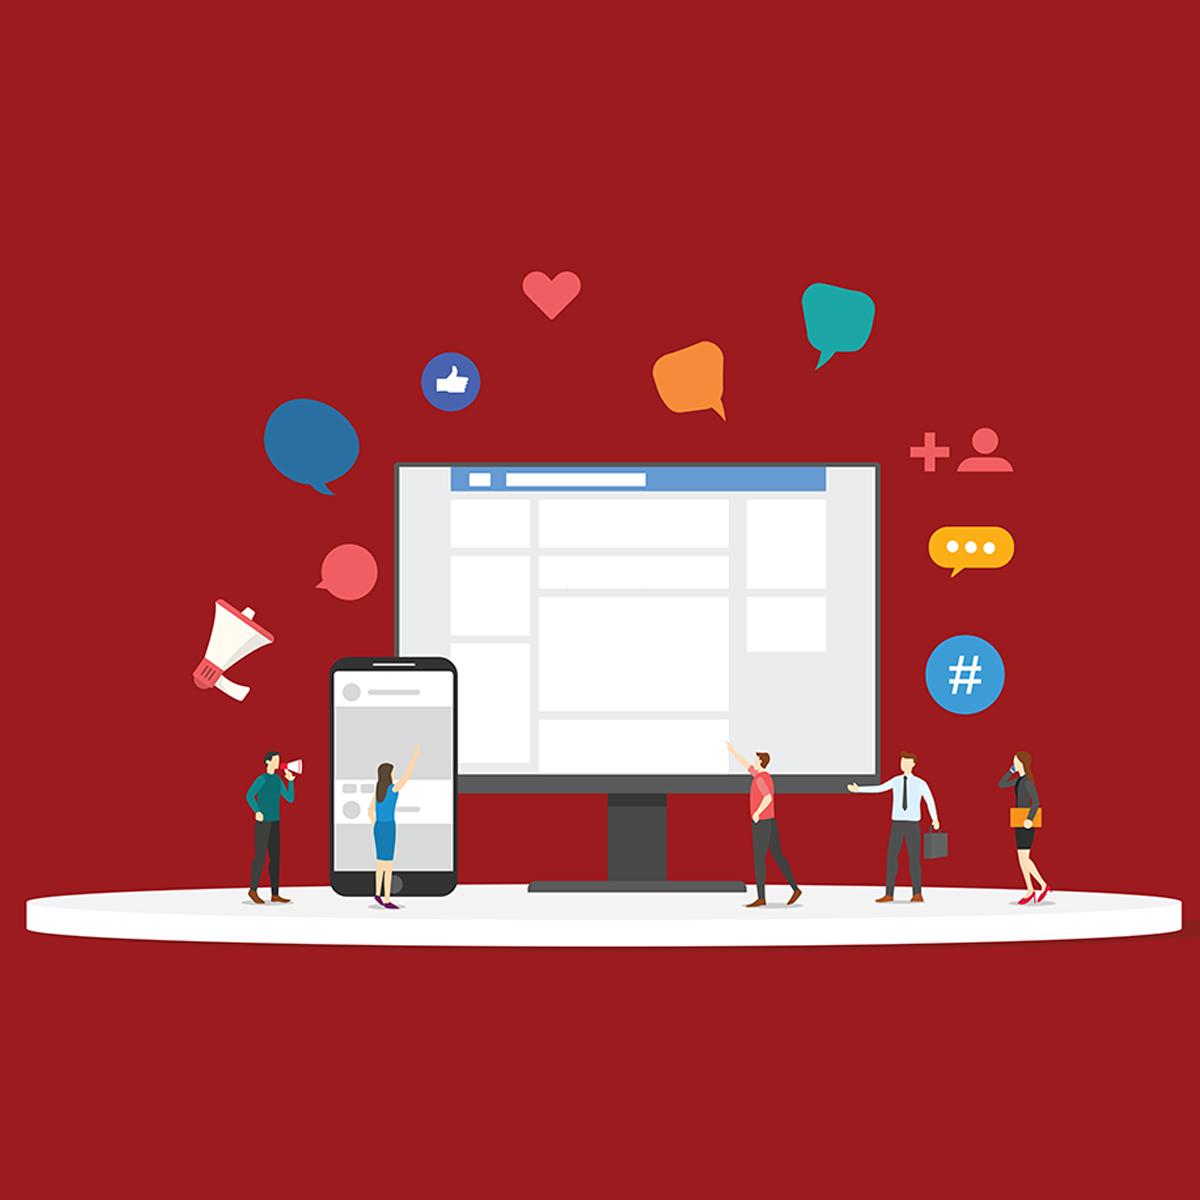 social media icons floating illustration